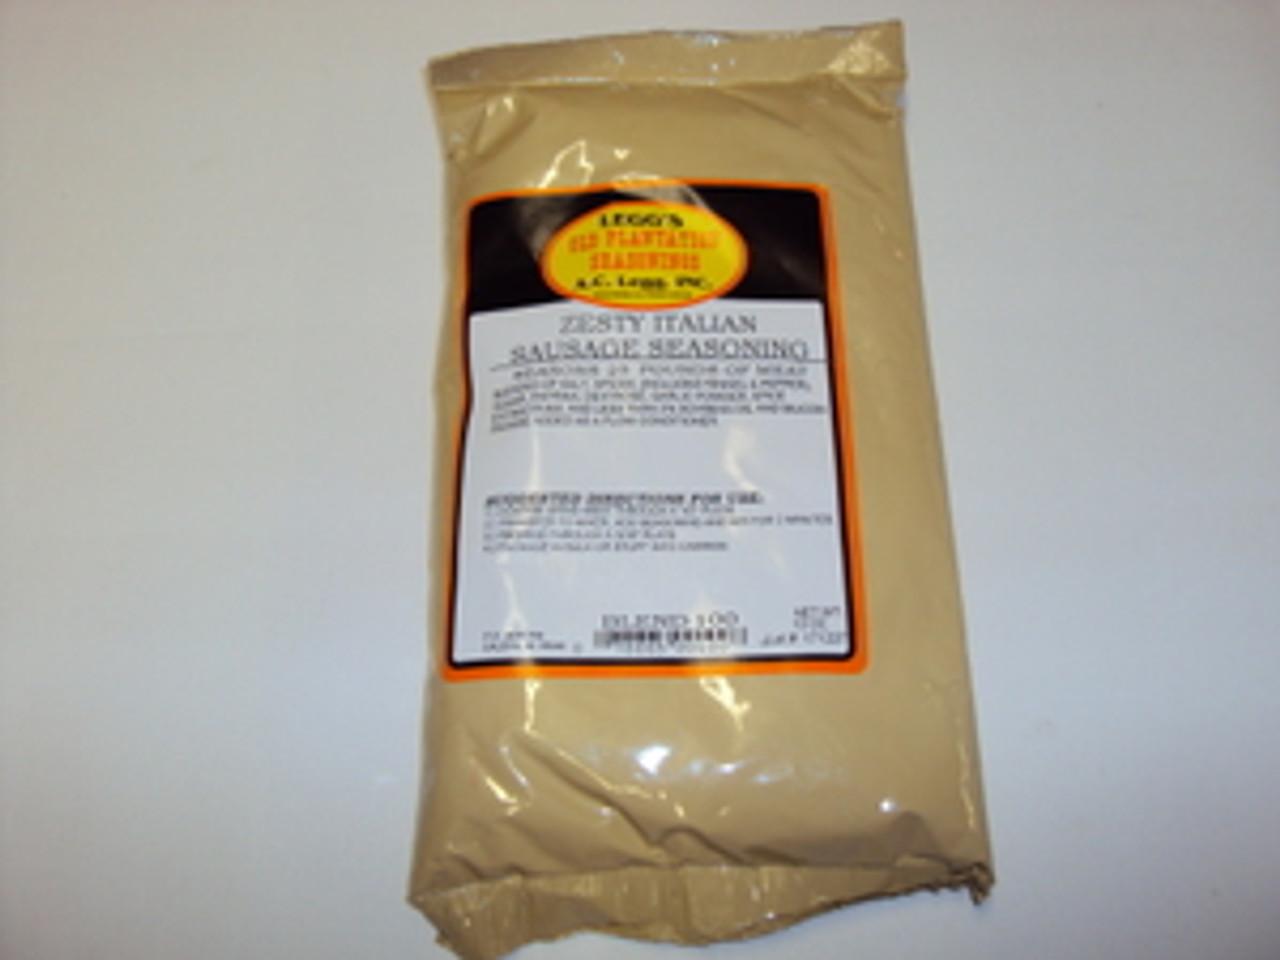 Blend # 100 - Legg's Old Plantation Zesty Italian Sausage Seasoning